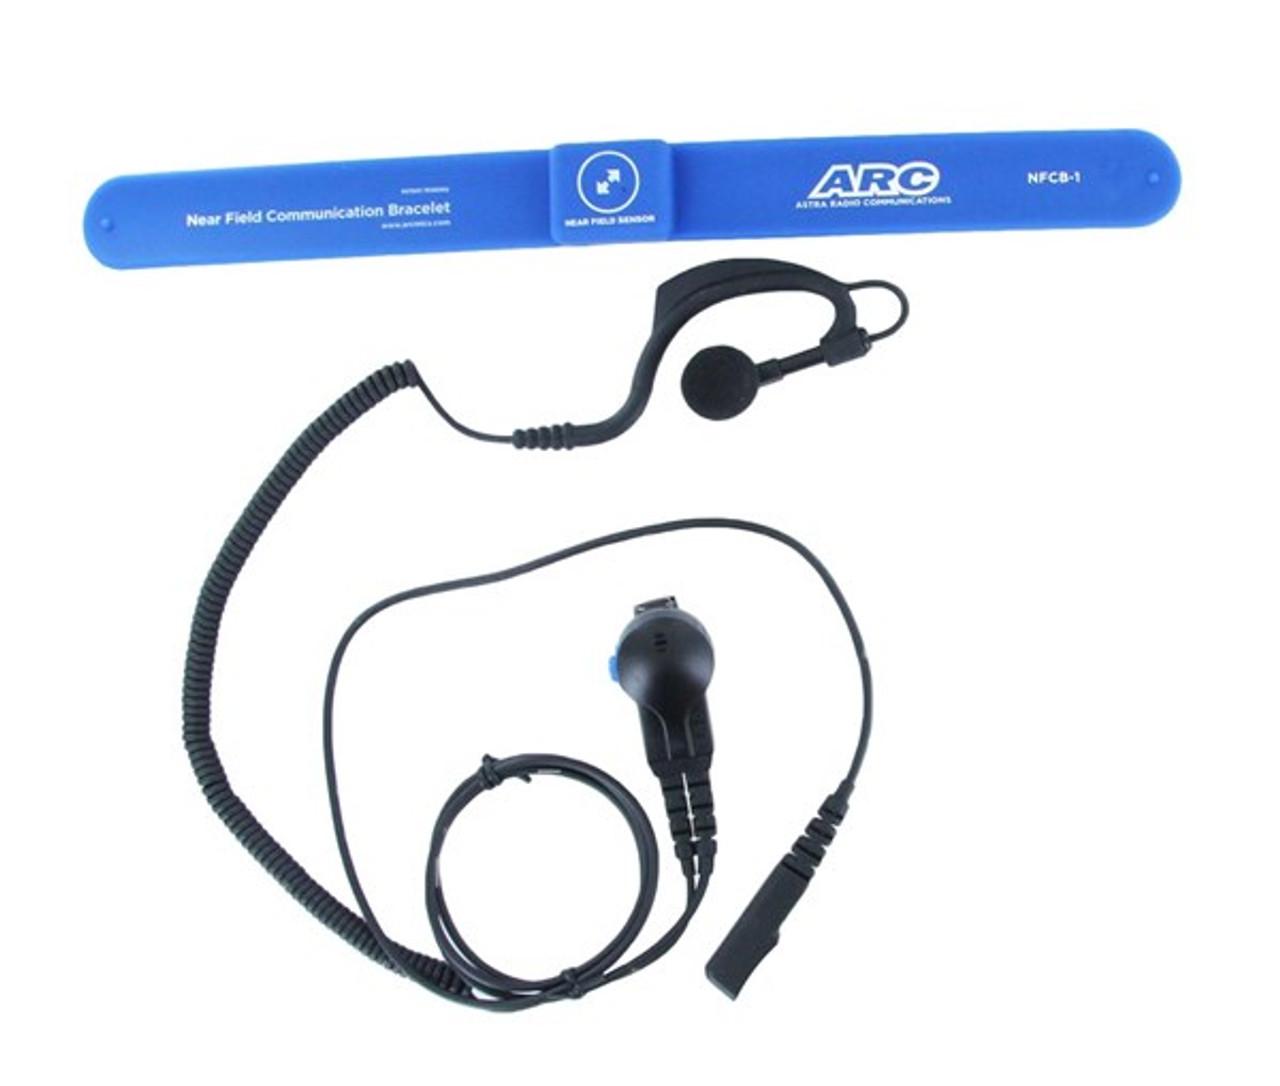 Astra G36 Touch Free Earpiece w/ Wireless Bracelet for Kenwood and Motorola two Way Radios